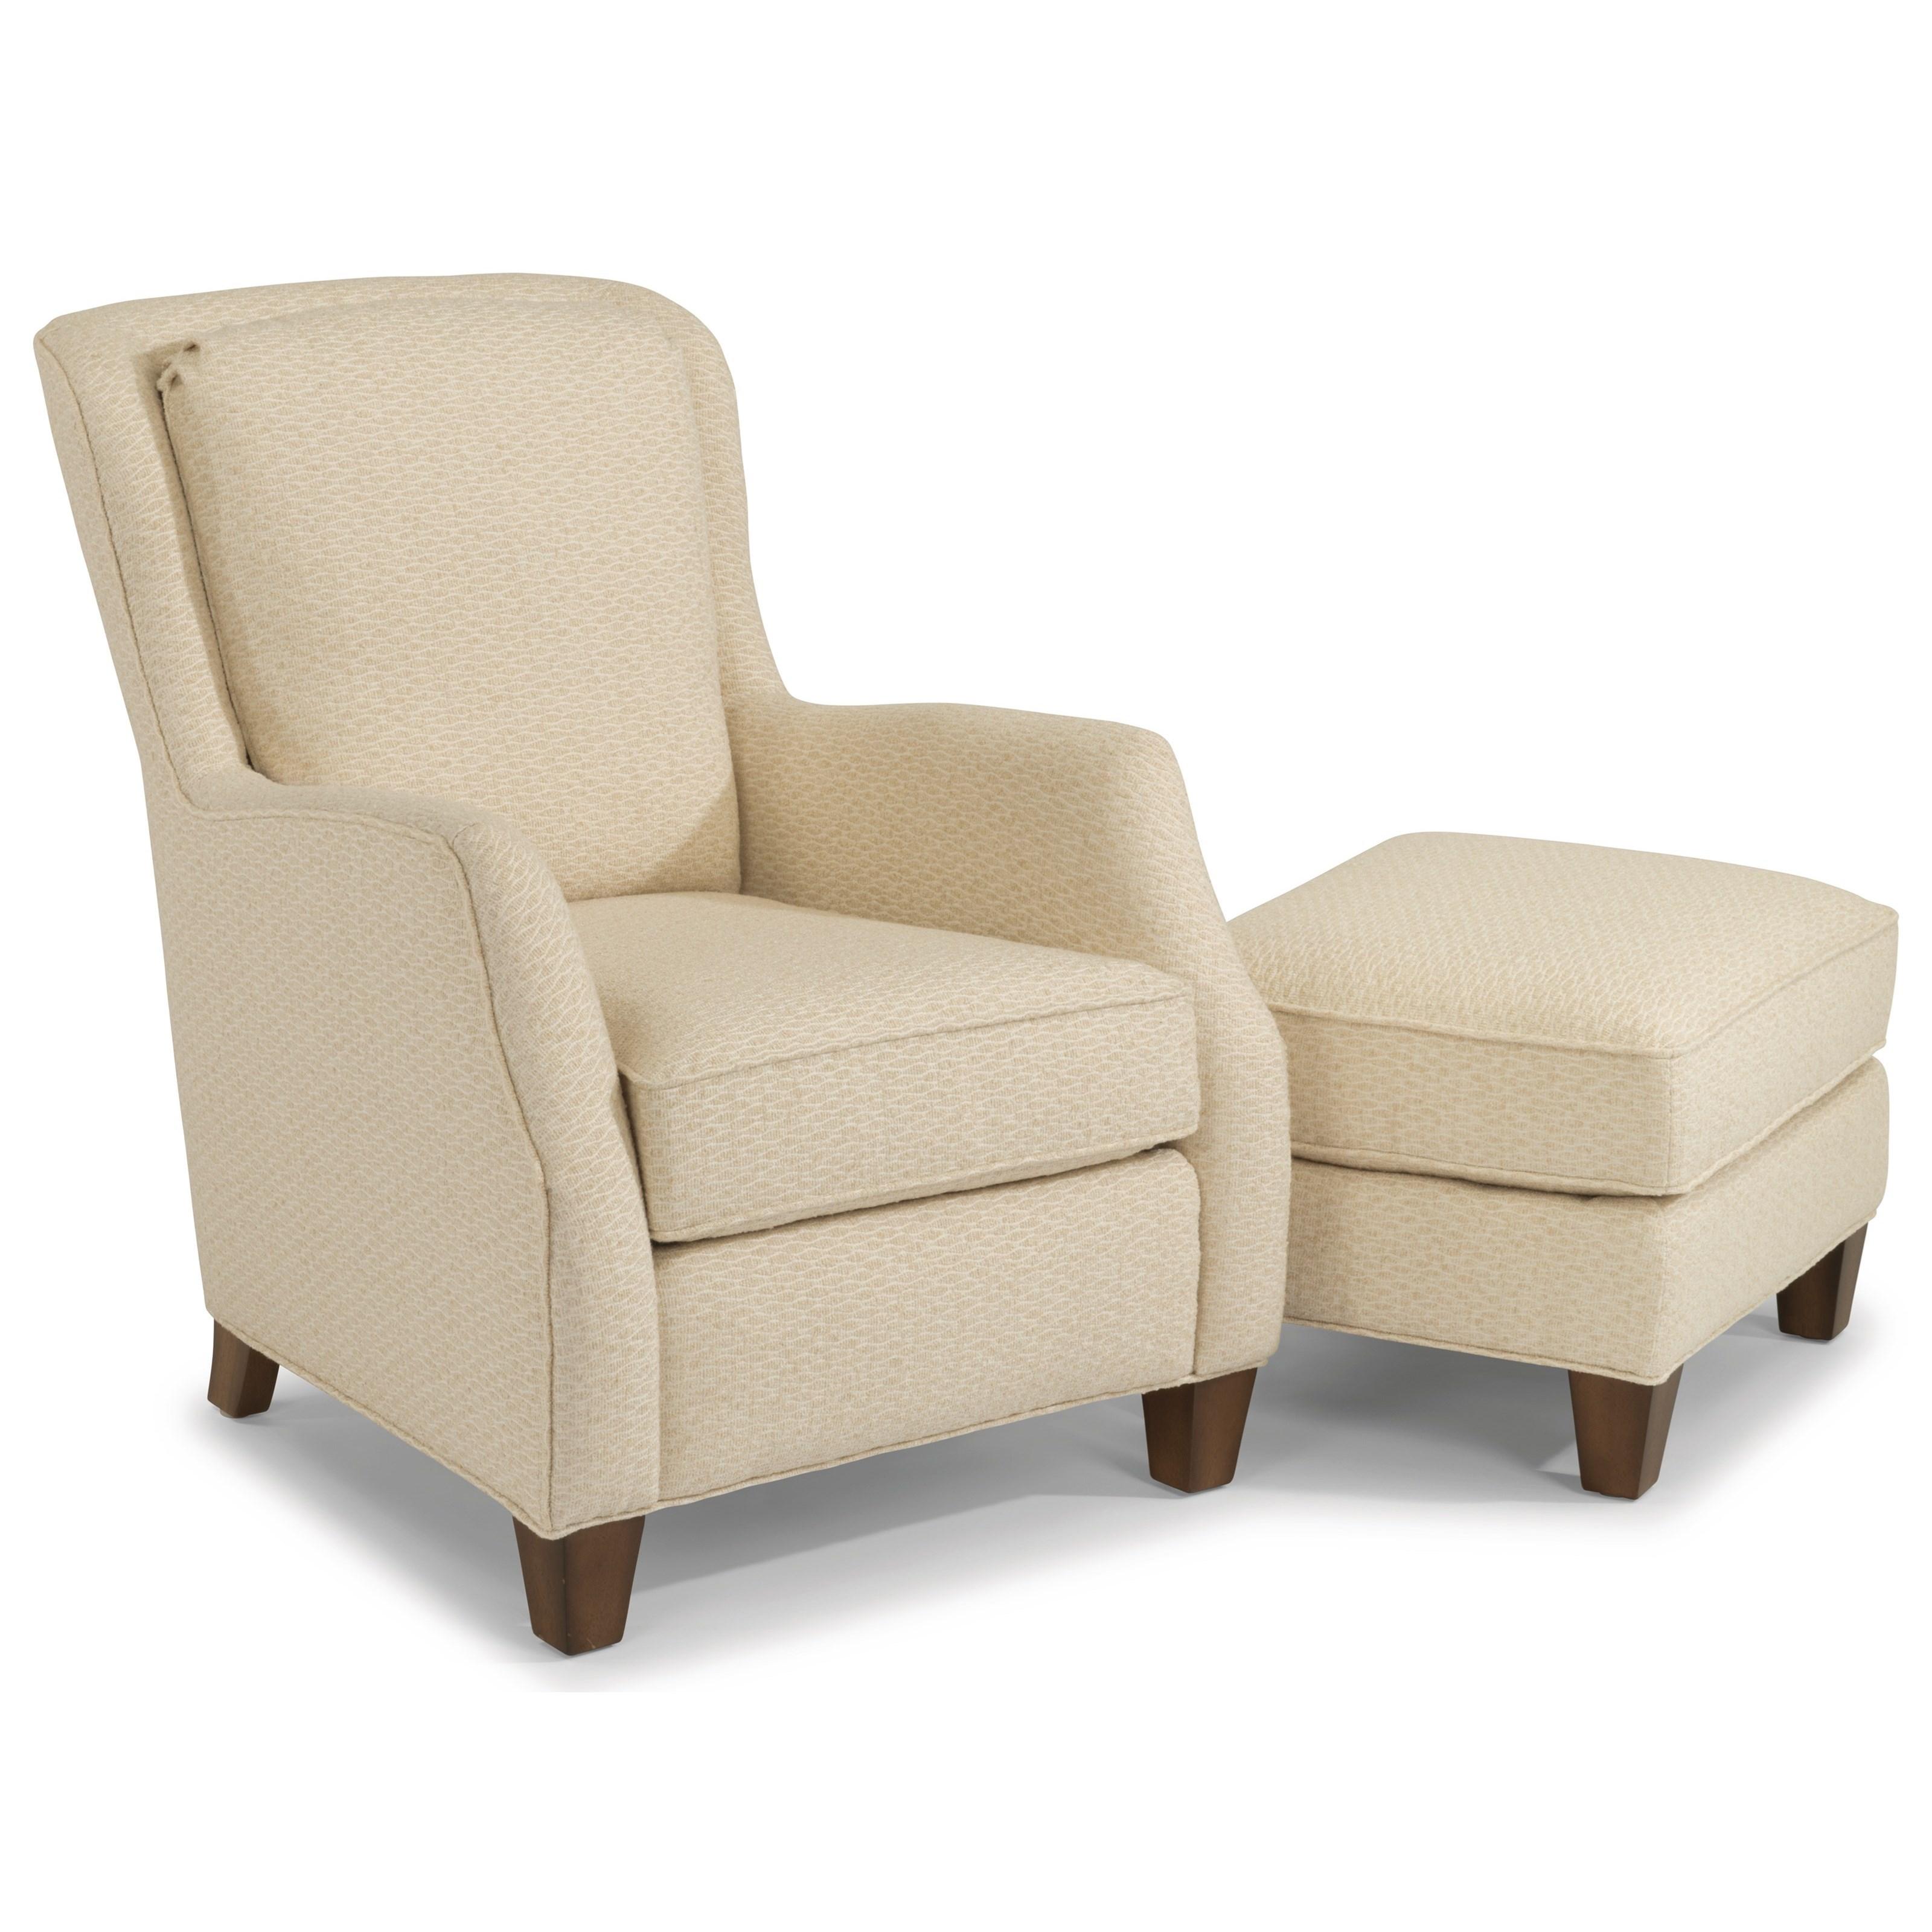 Flexsteel Accent Chair 0410: Flexsteel Accents 0124-10 Allison Chair